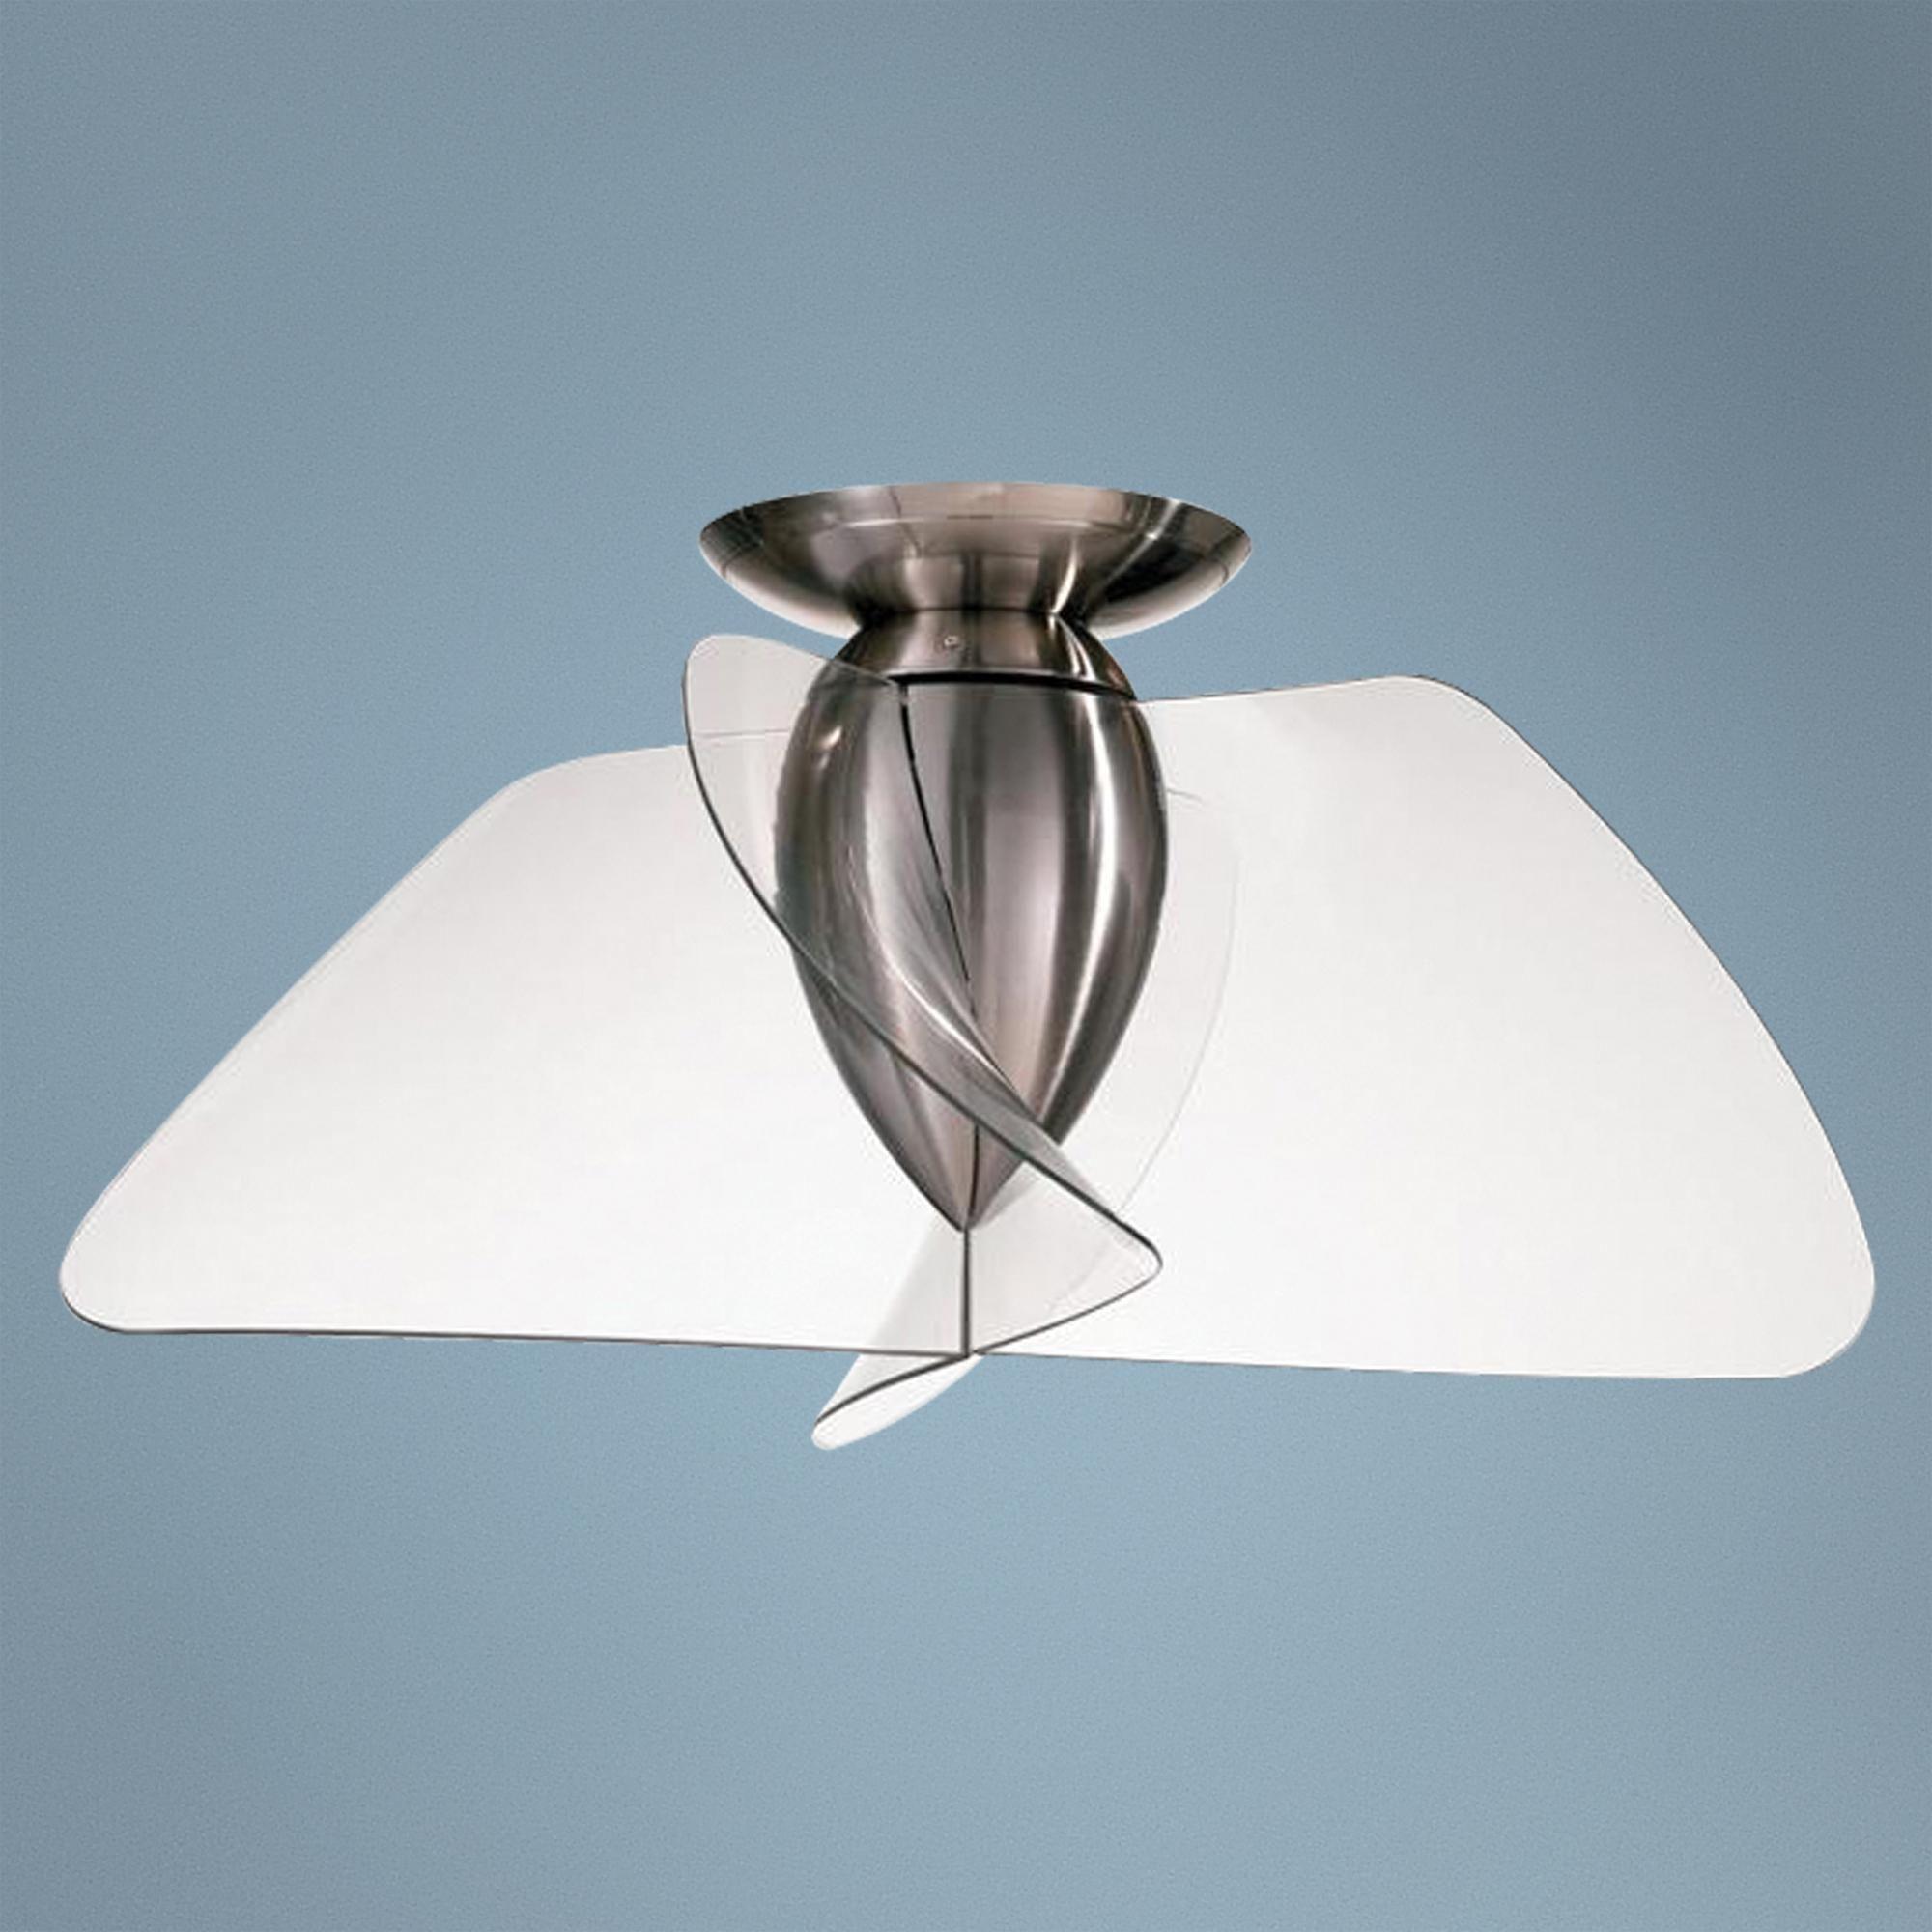 42 Quorum Angel Collection Clear Blade Ceiling Fan Lampsplus